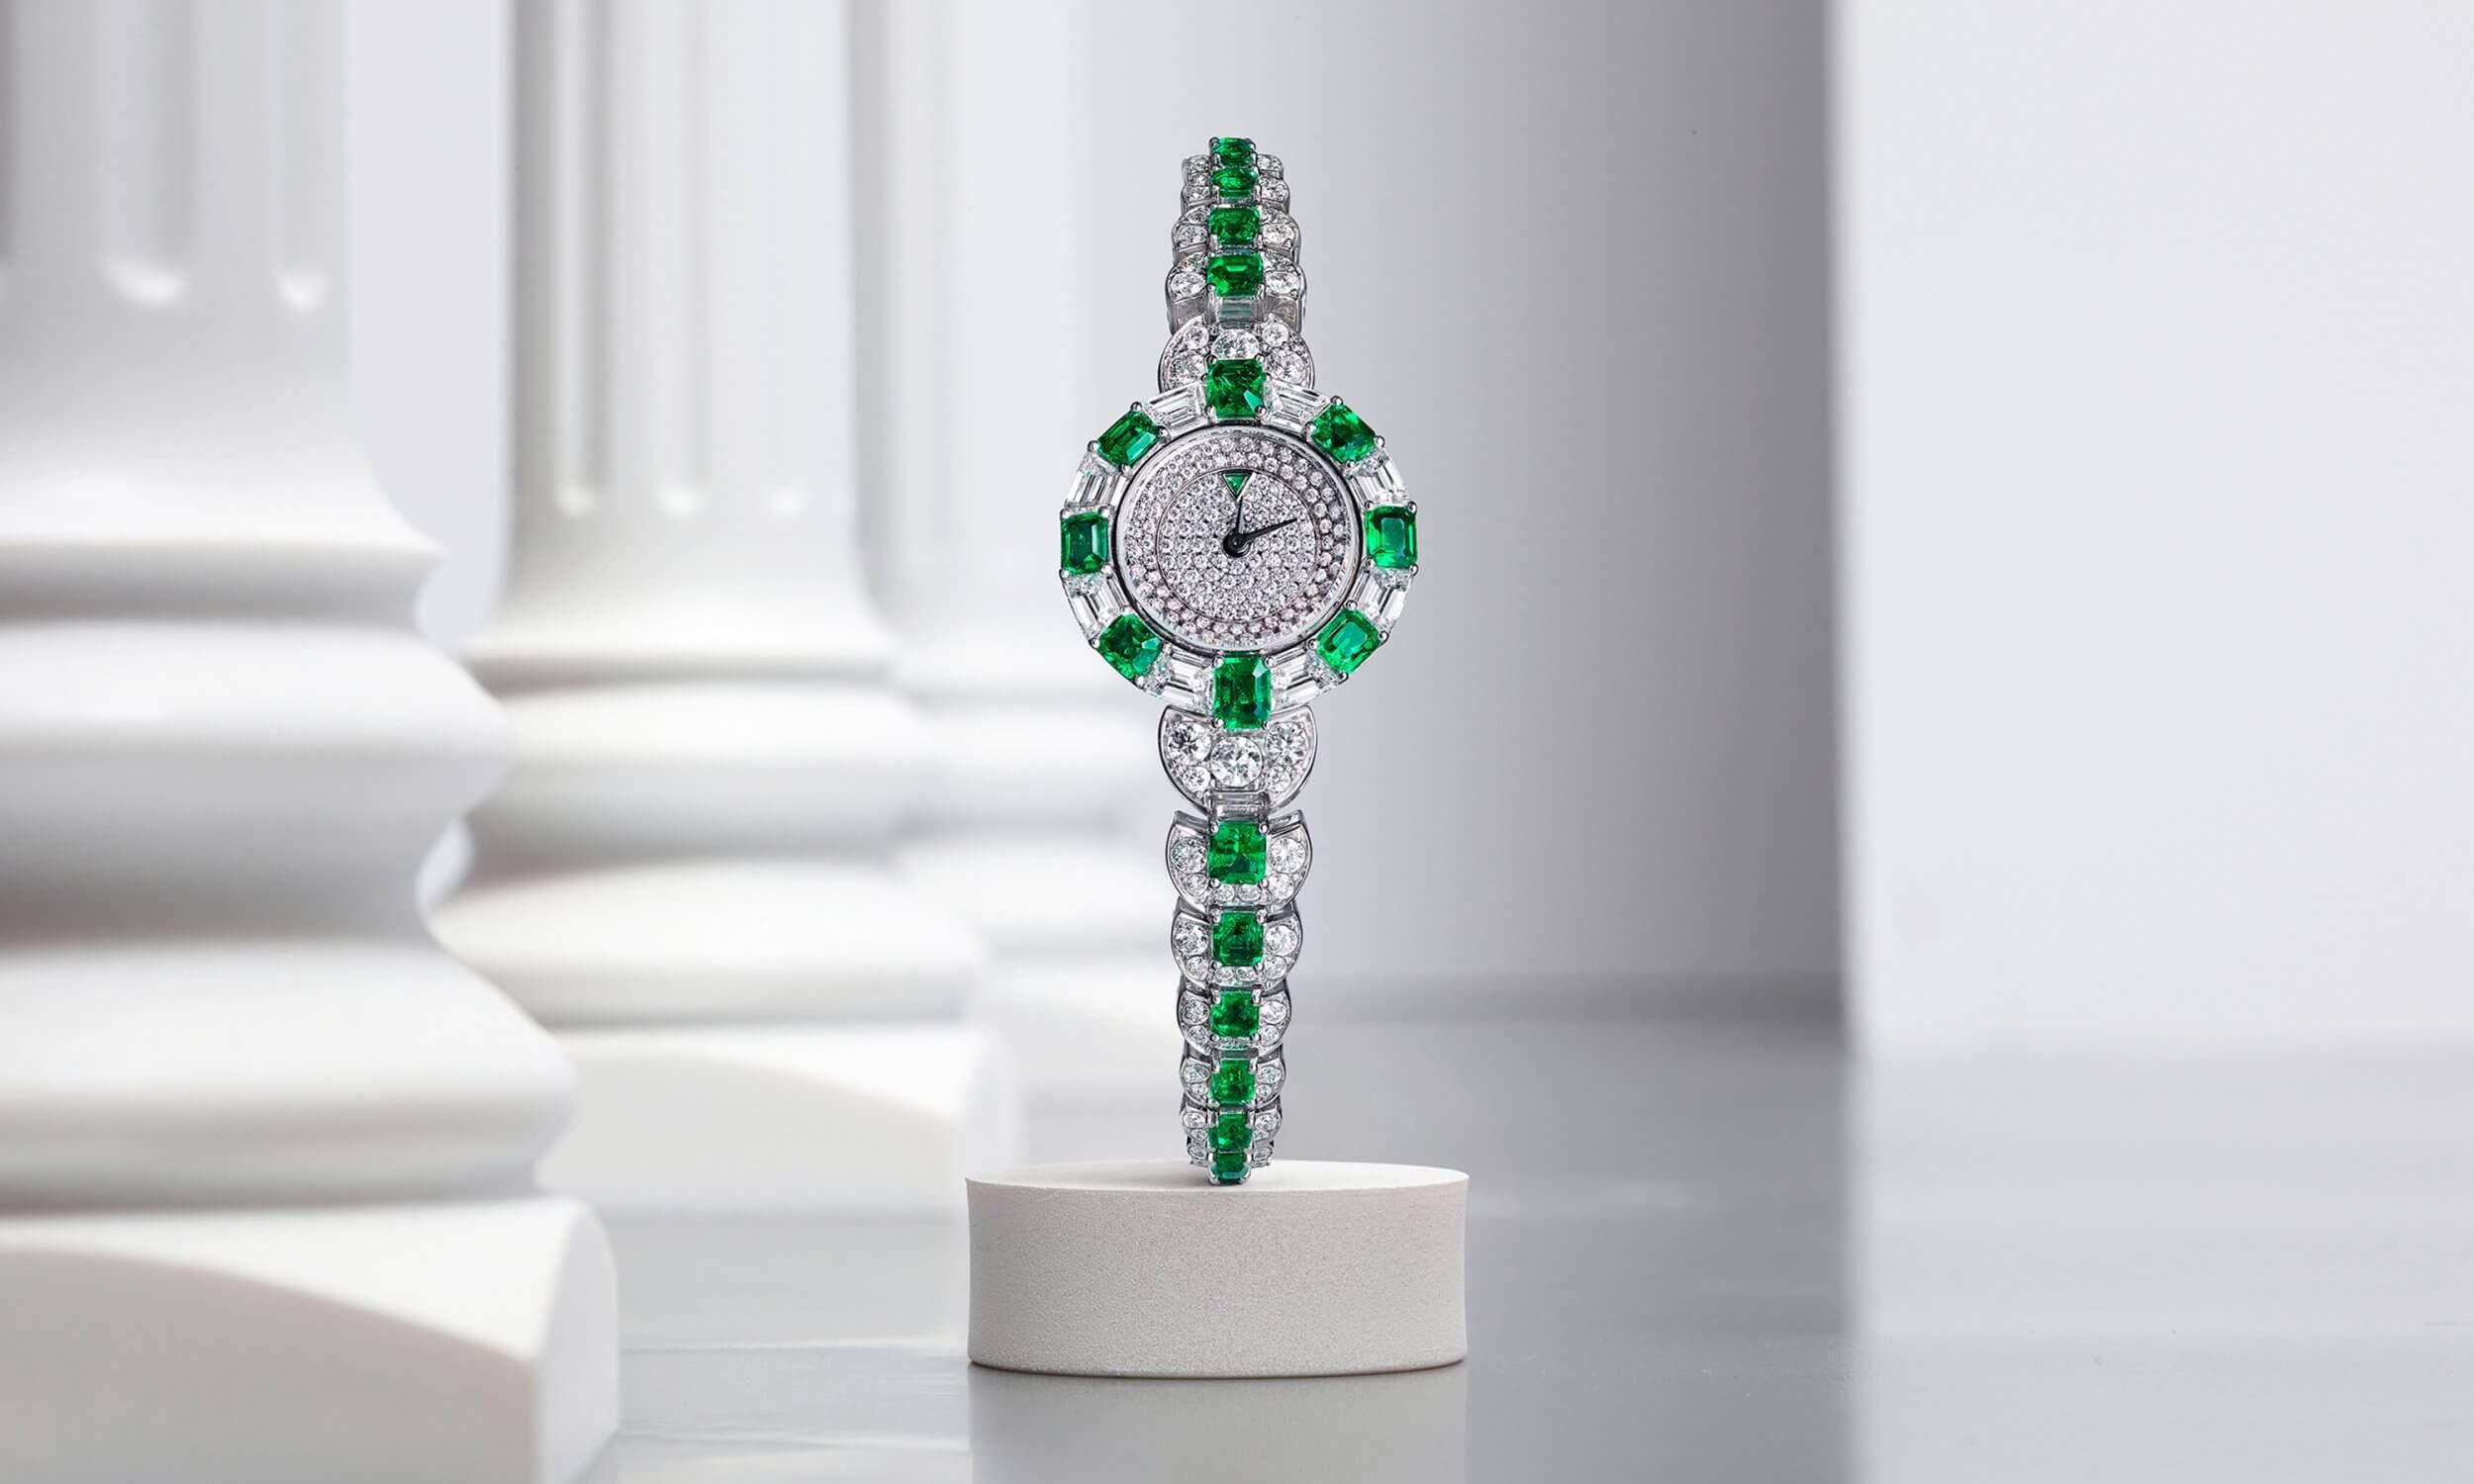 Graff Mini Deco Watch Emerald and Diamond on a Multishape Emerald and Diamond Bracelet inside a Gallery